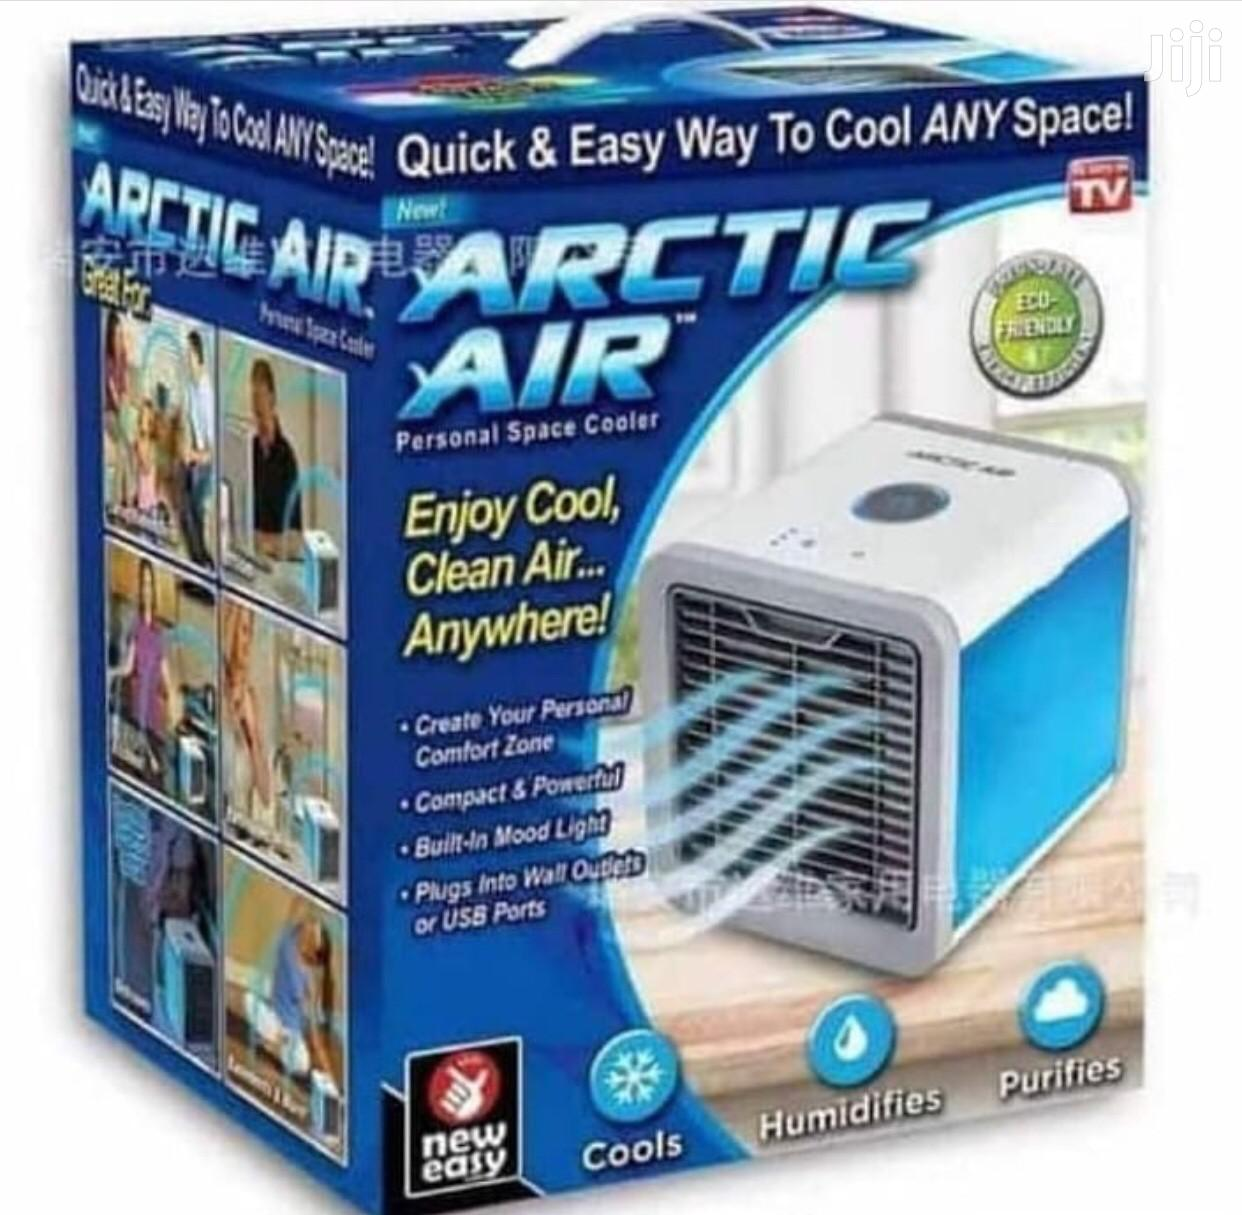 Arctic Air Mini Ac | Home Appliances for sale in Ilupeju, Lagos State, Nigeria